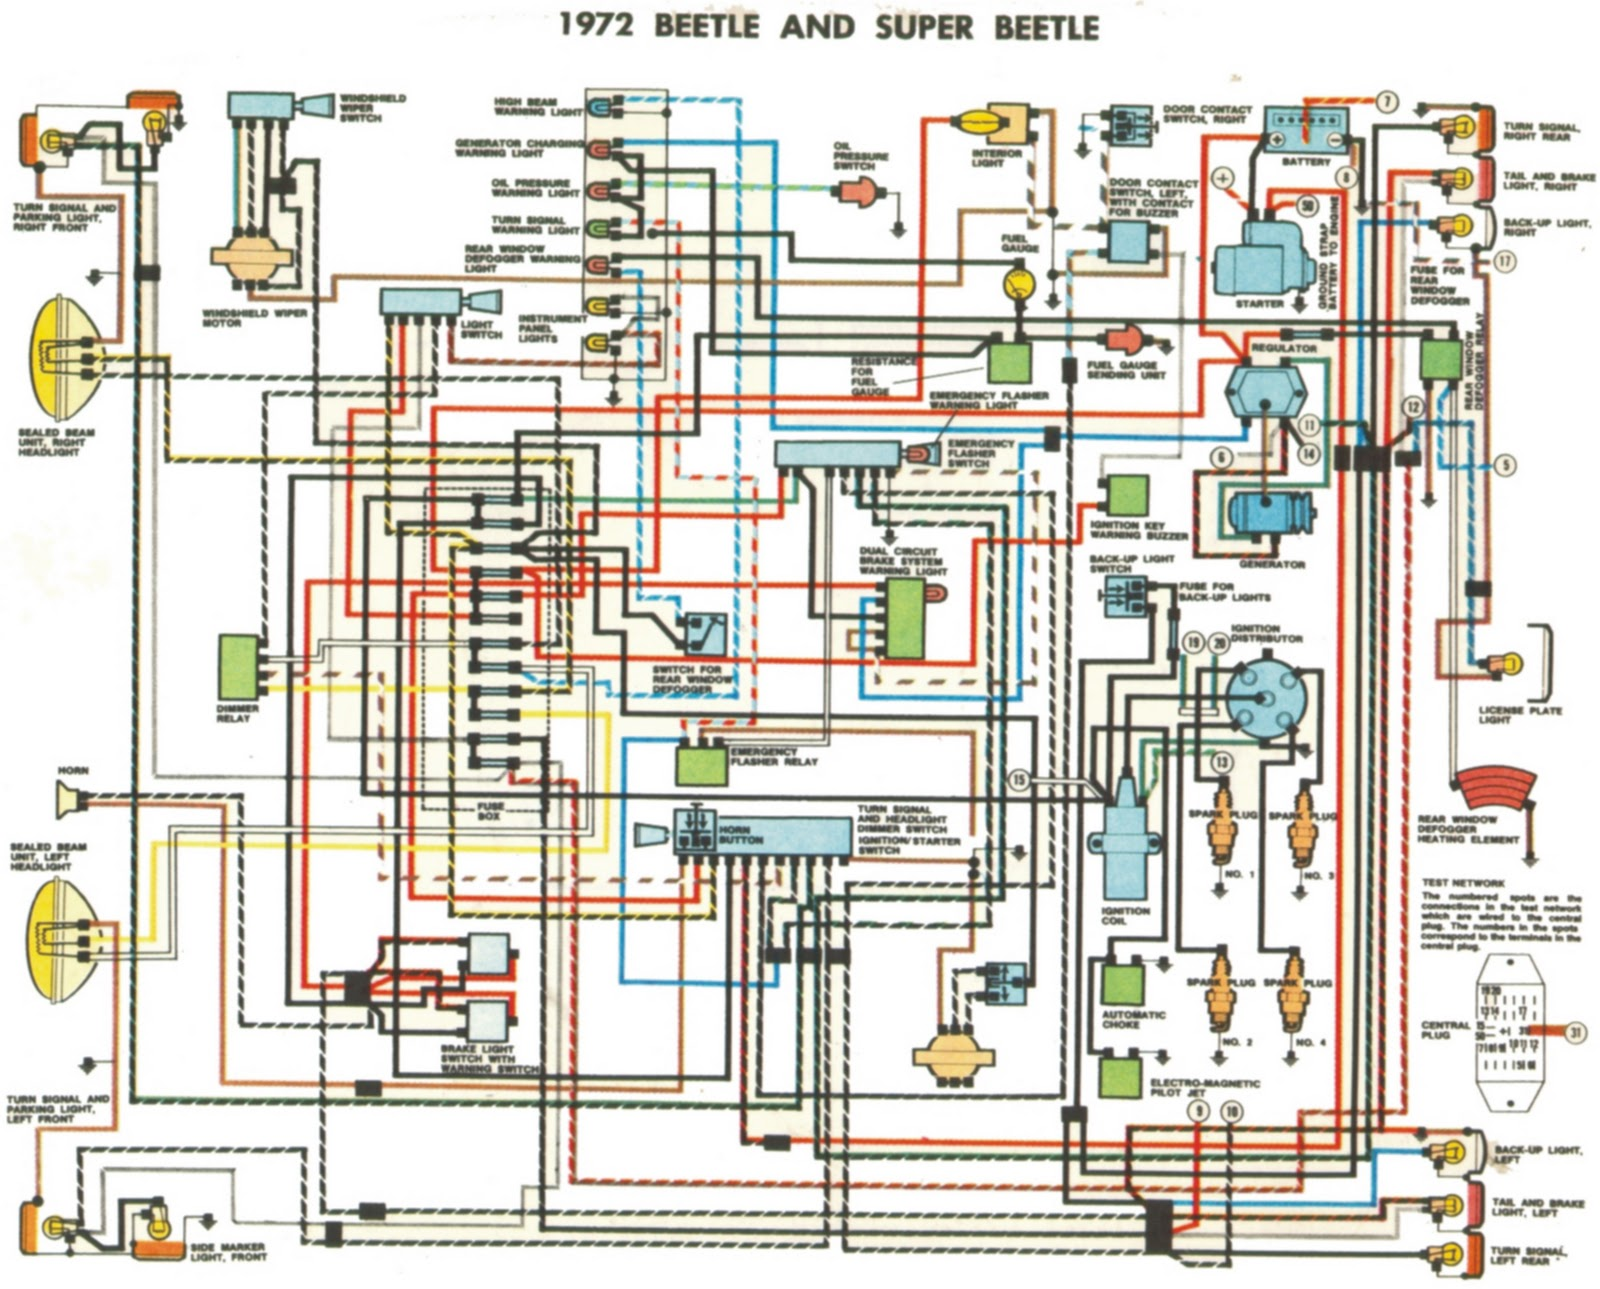 1972 volkswagen super beetle wiring cl 8626  vw voltage regulator wiring diagram additionally 72 vw  vw voltage regulator wiring diagram